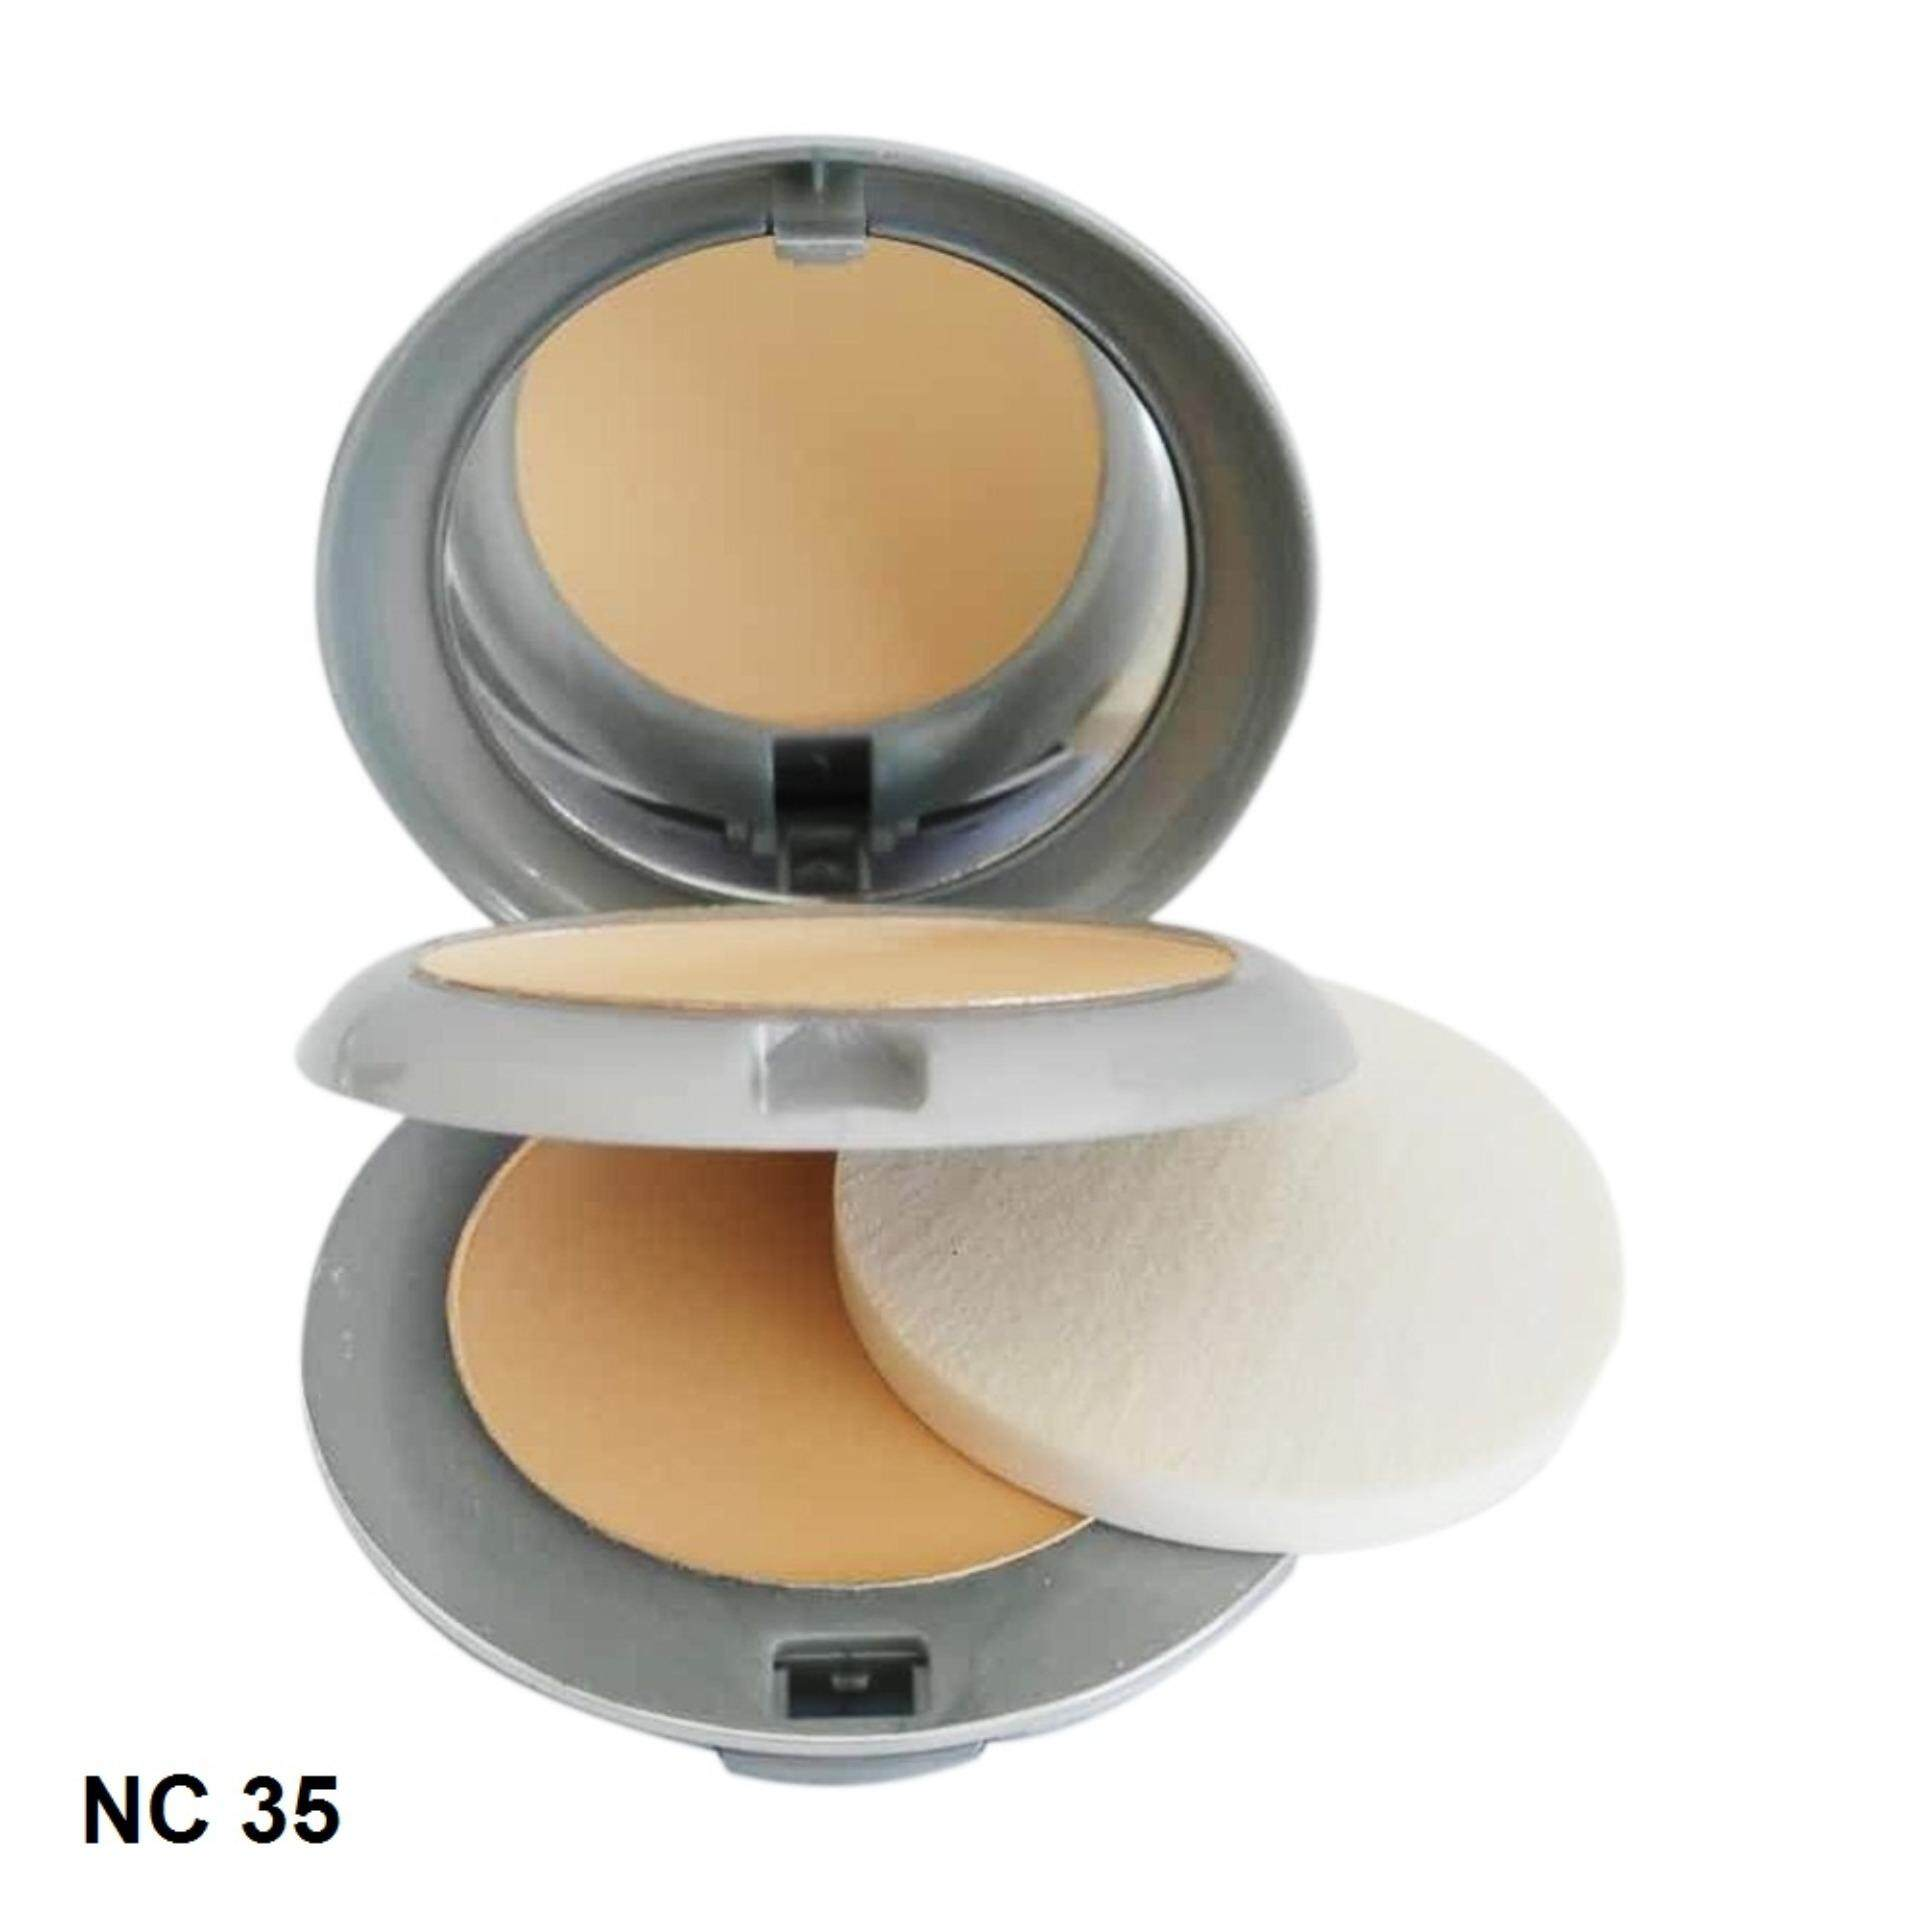 Professioanal Studio Perfect Compact Powder 2 in 1 SPF 15 (NC 35)